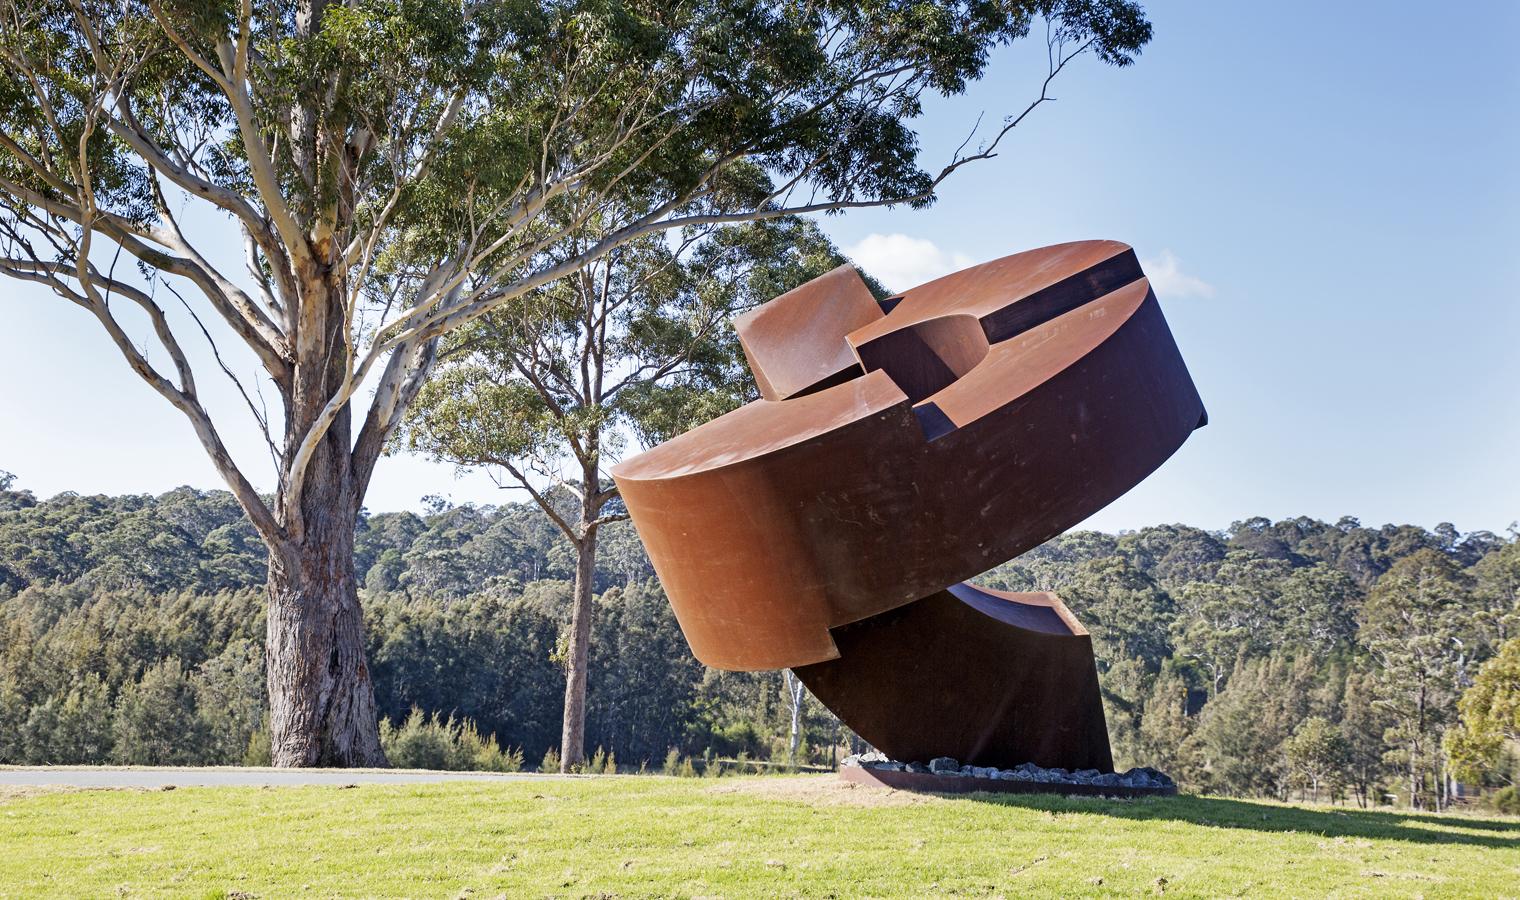 existance-Sculpture-website-template-size-1520x900